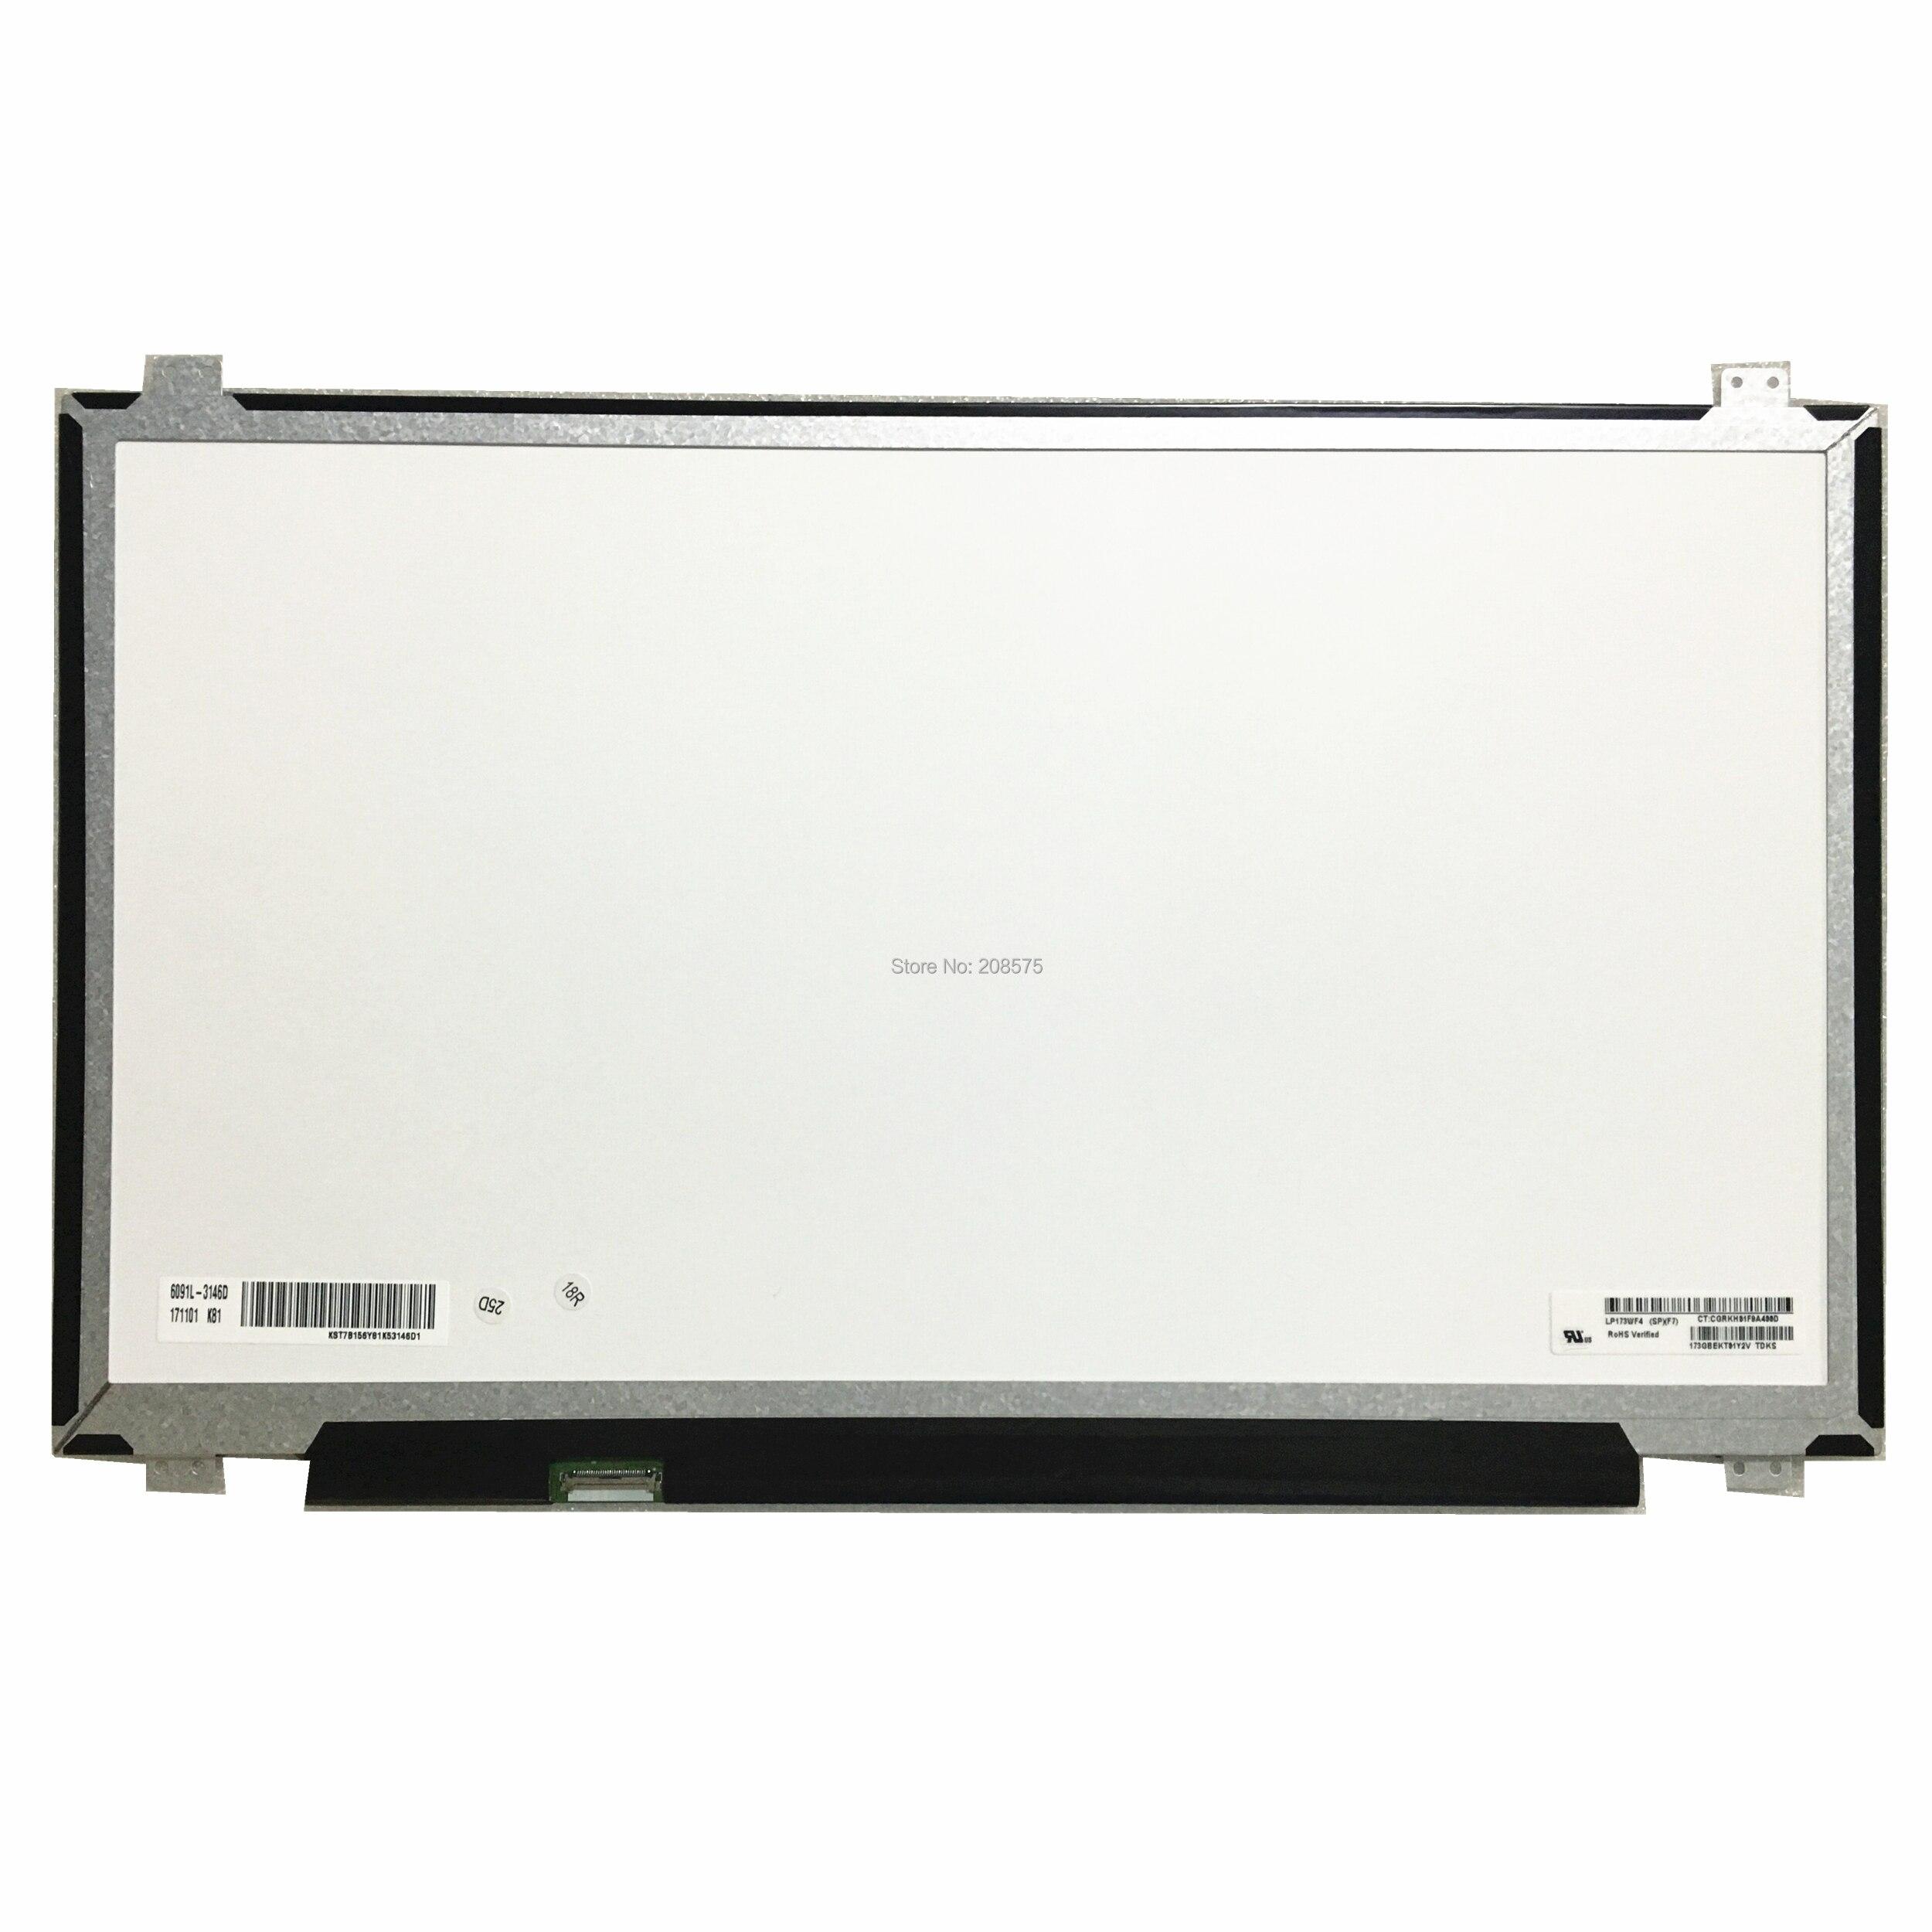 Free shipping LP173WF4-SPF7 LP173WF4 SPF7 SPF5 SPF4 SPF2 SPF1 B173HAN01.0 N173HCE-E31 Laptop lcd screen 1920*1080 edp 30pins IPS